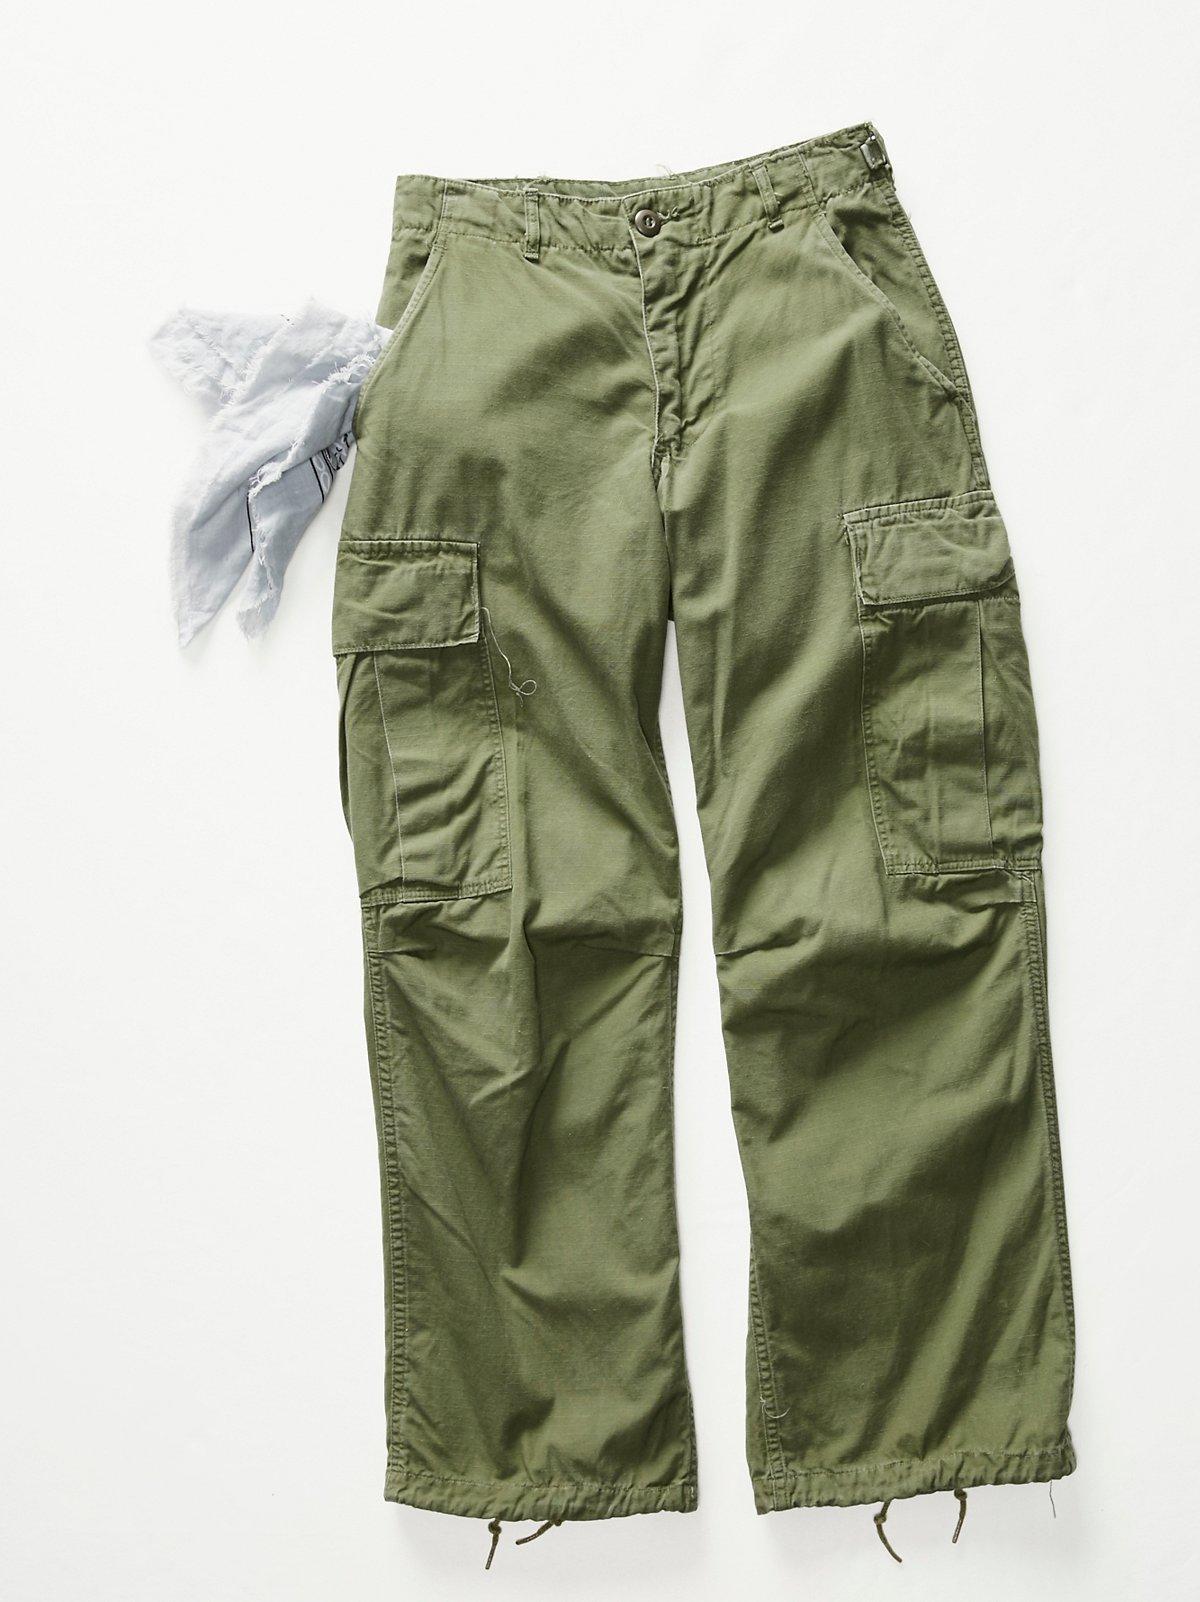 Vintage 1970s Military Pants